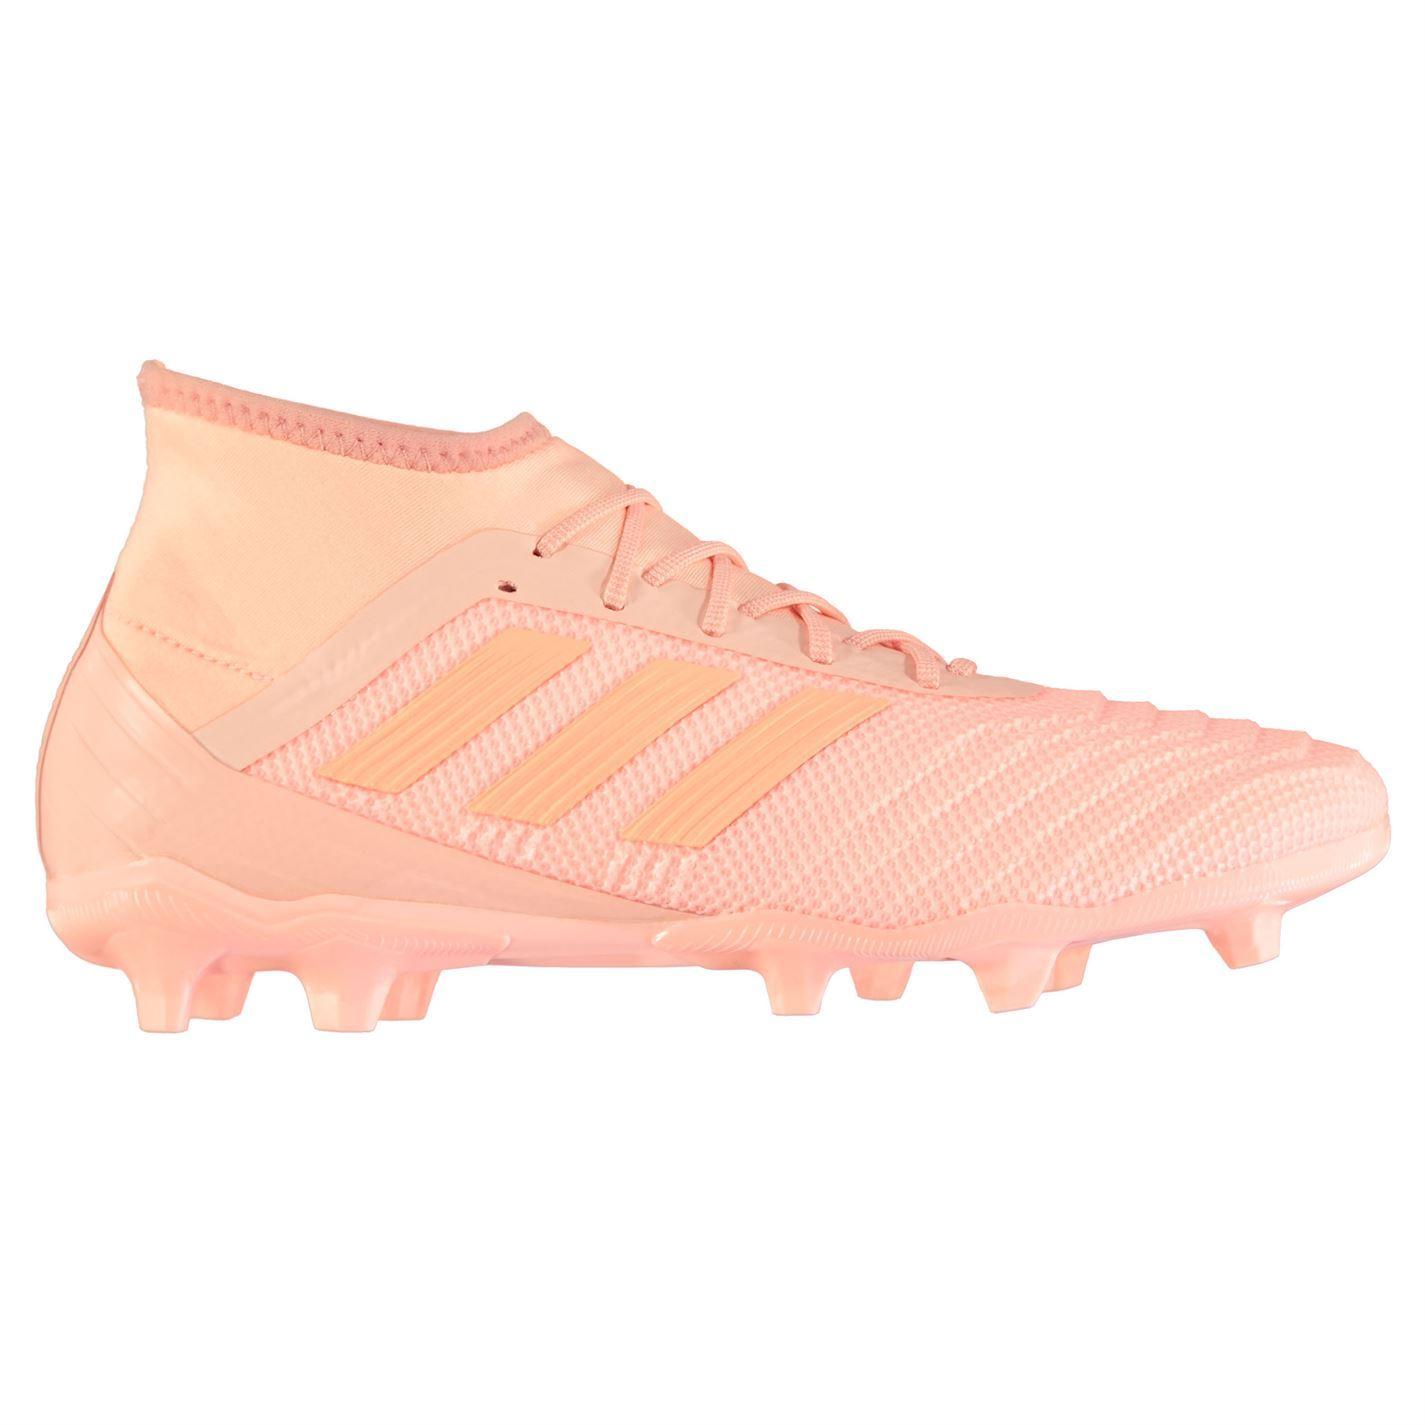 Adidas-Predator-18-2-FG-Firm-Ground-Chaussures-De-Football-Homme-Football-Chaussures-Crampons miniature 8